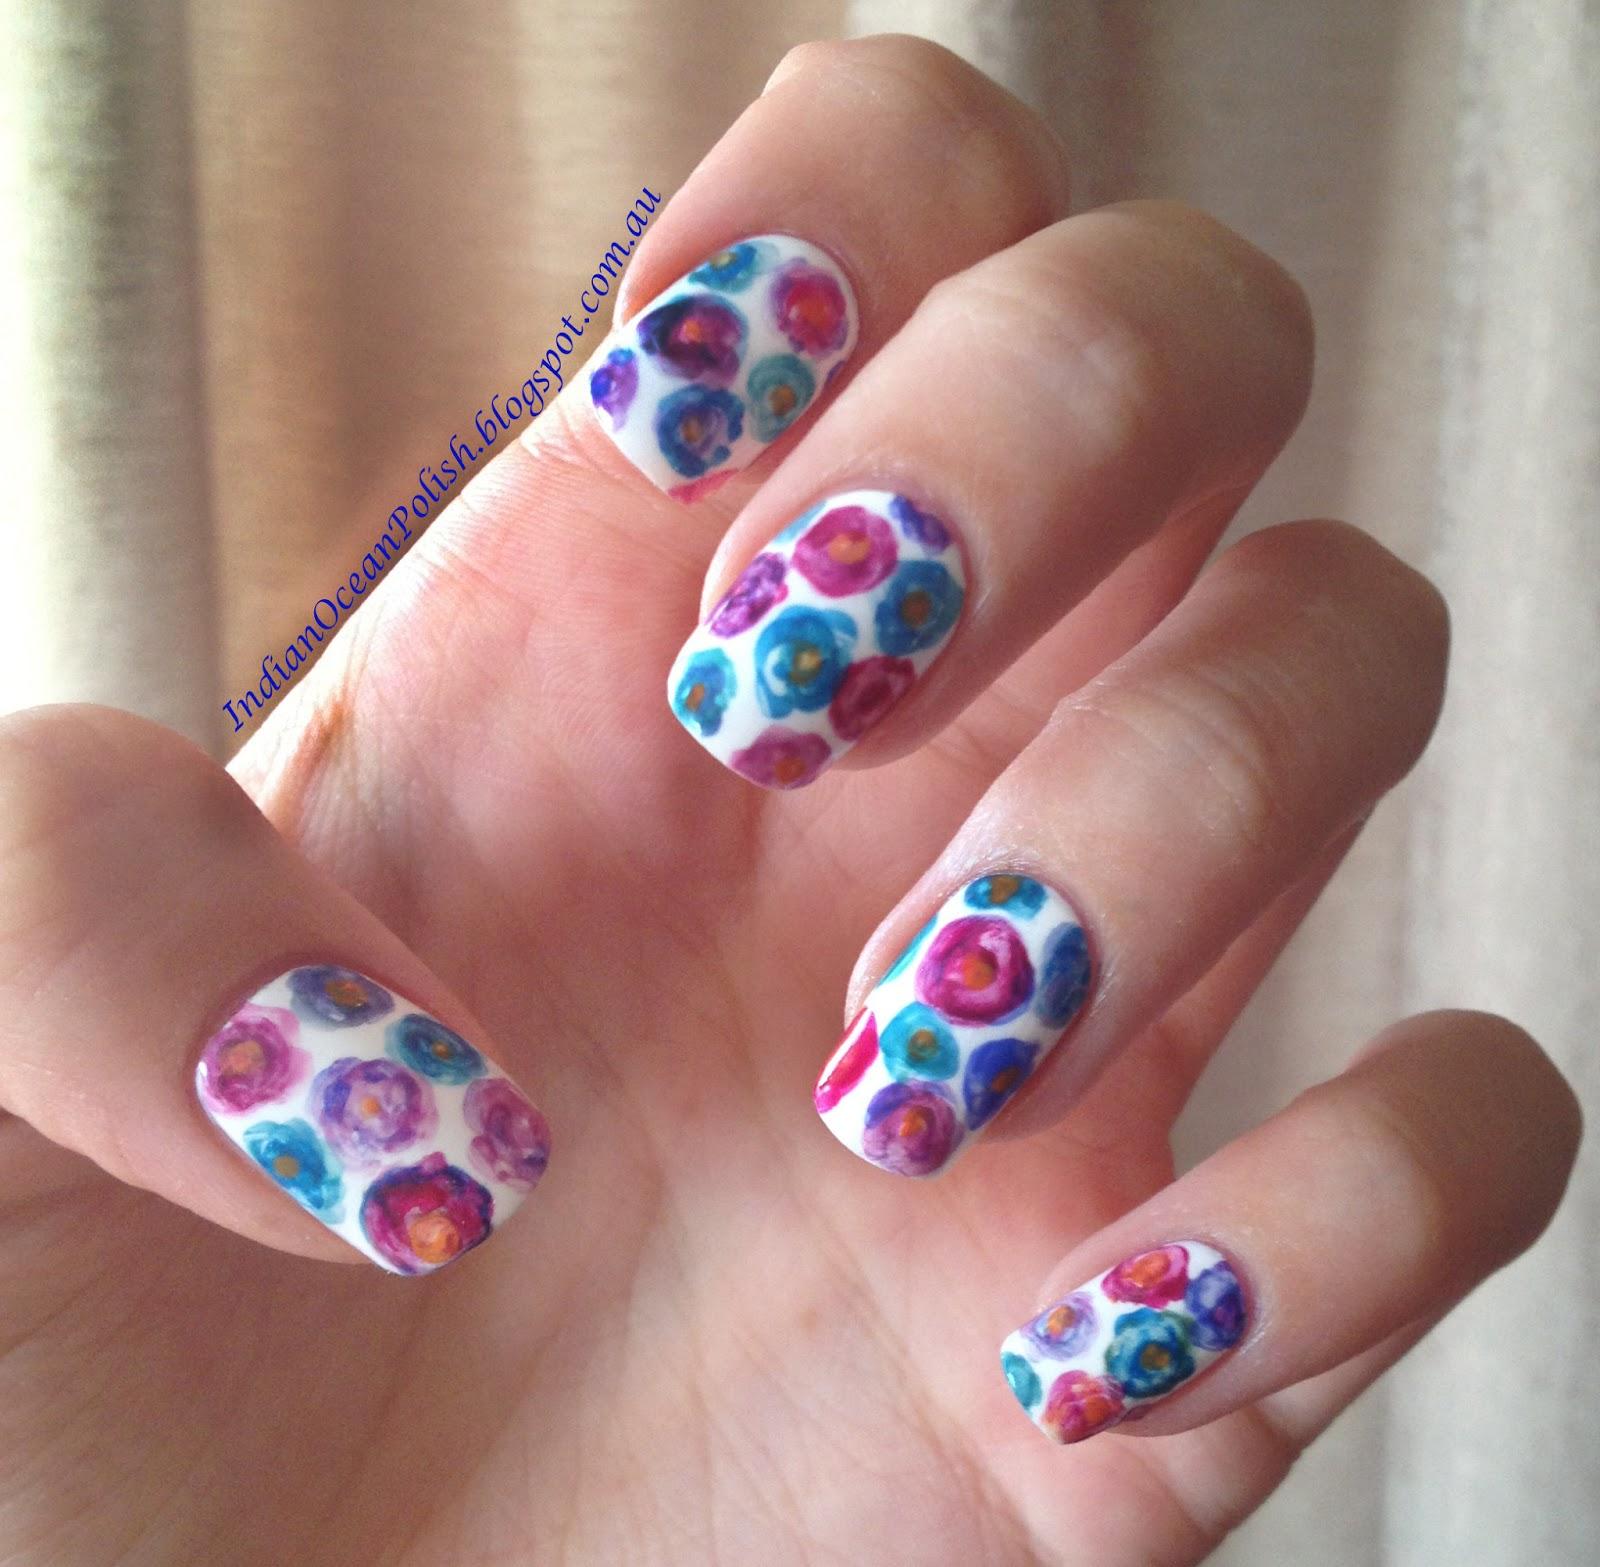 Flower Nail Art: Indian Ocean Polish: Simple Watercolour Flower Nail Art